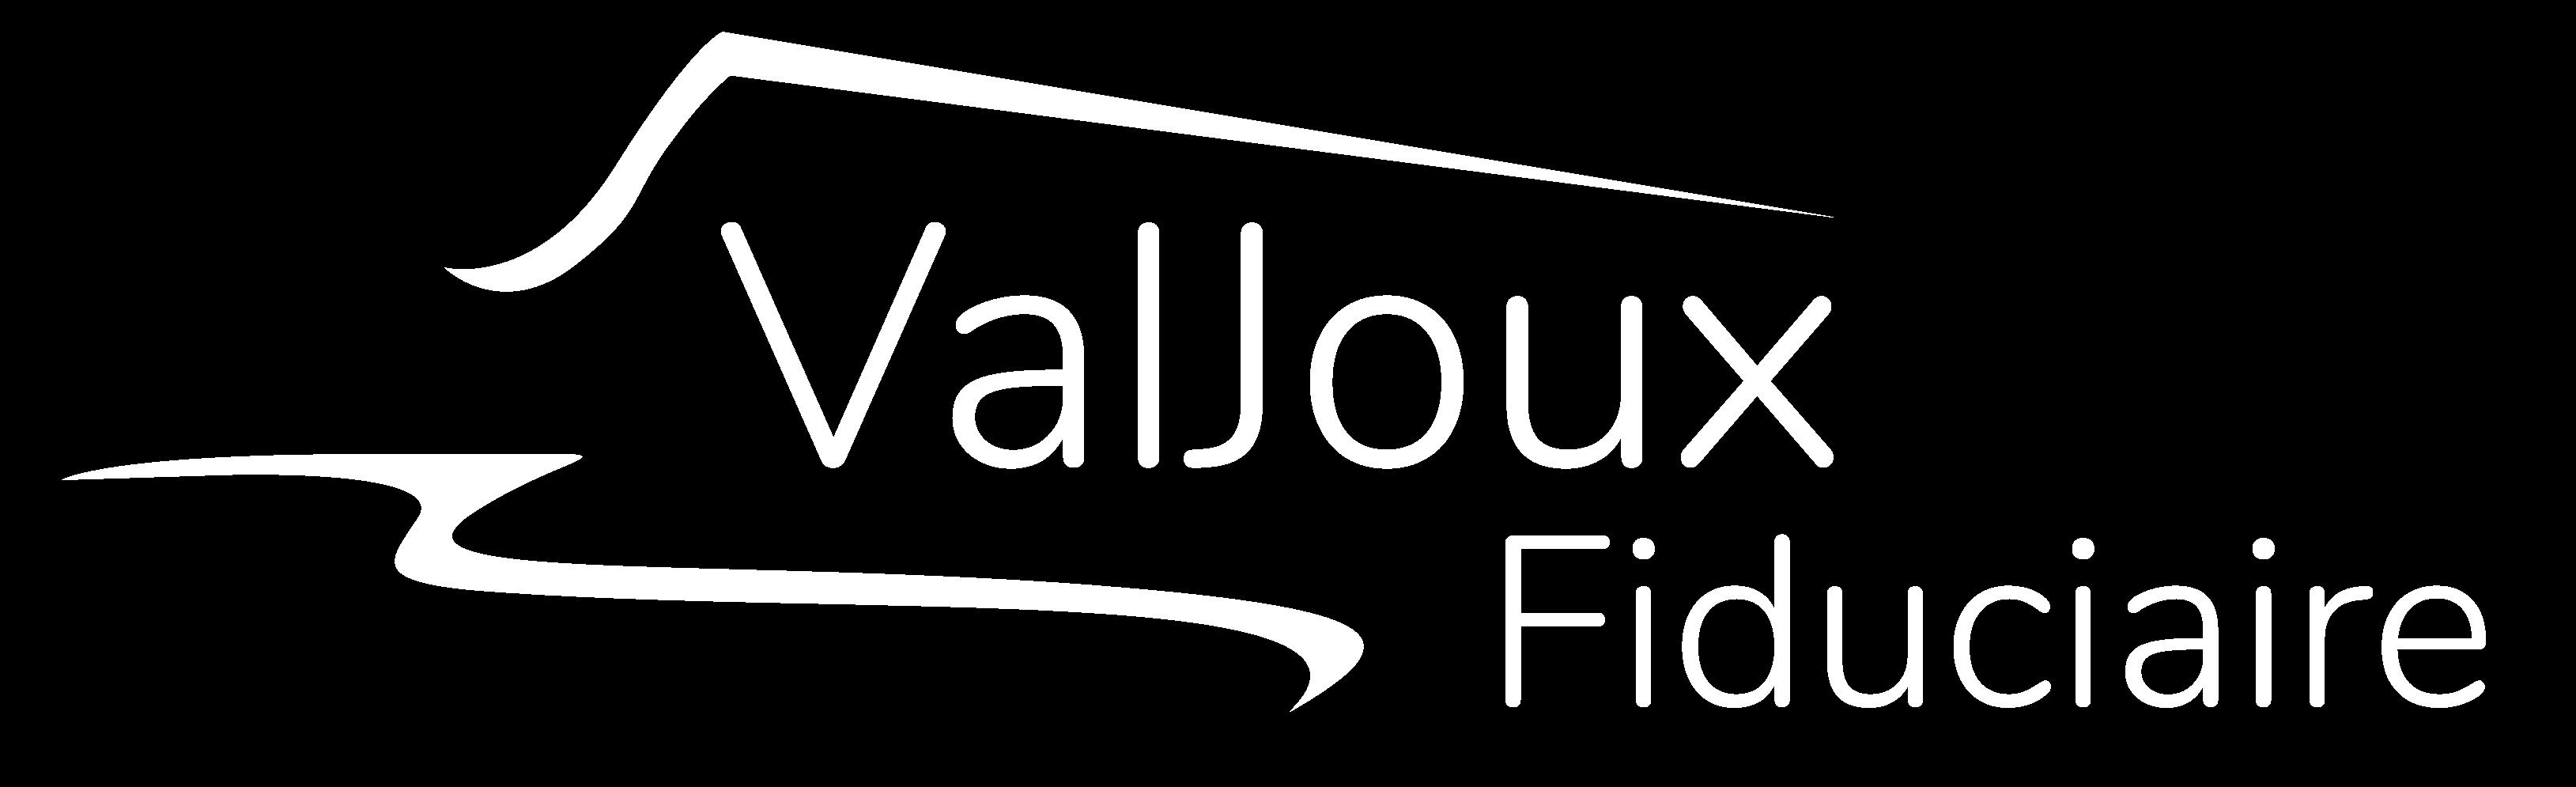 ValJoux Fiduciaire